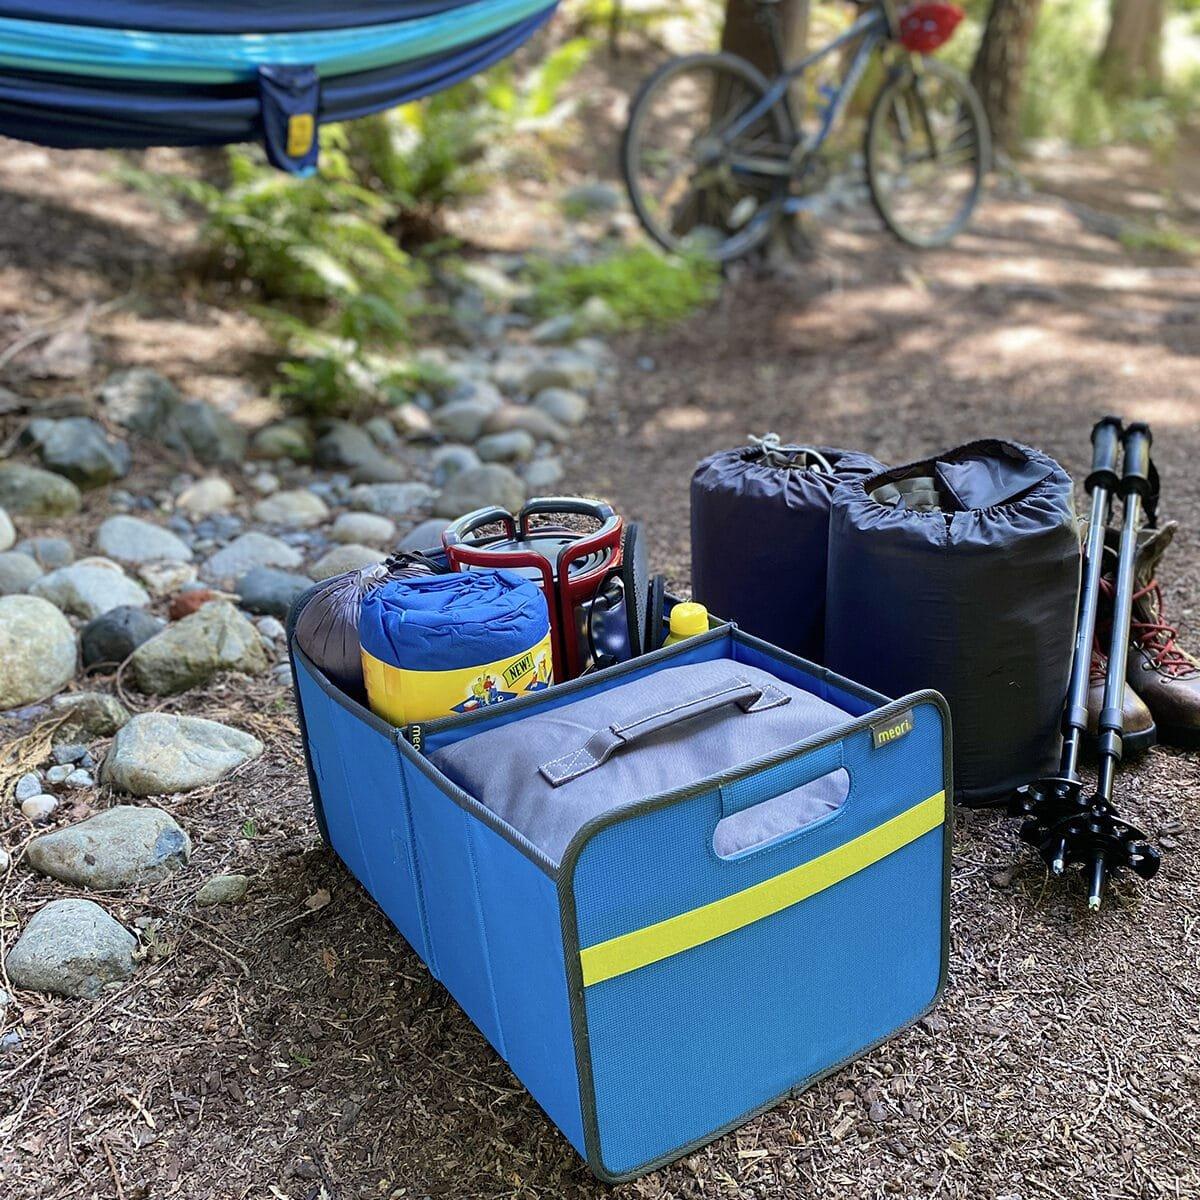 Premium Trunk Organizer with Cooler Insert